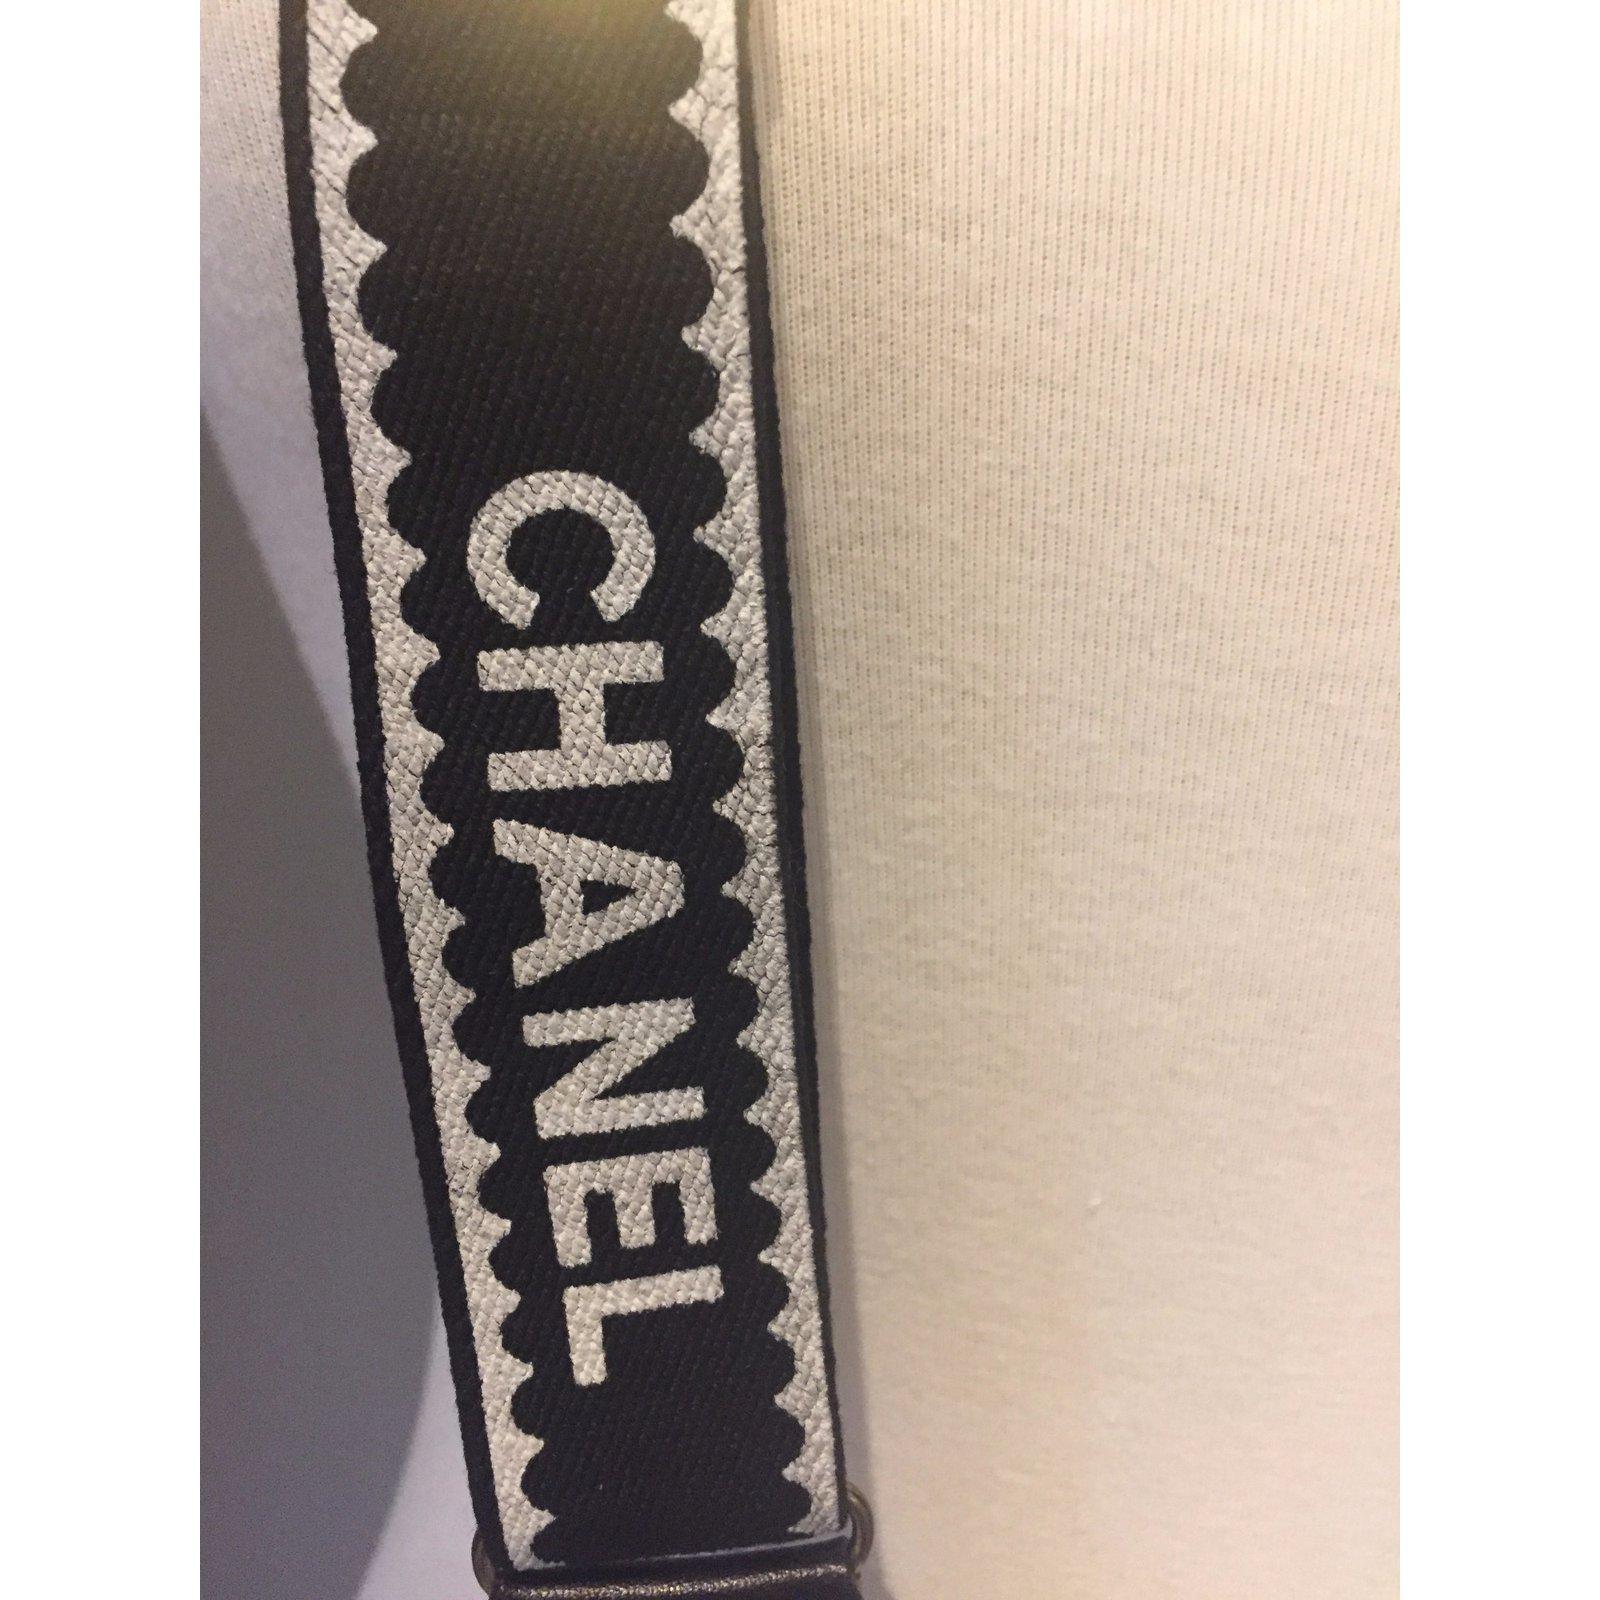 chanel suspenders. chanel suspenders